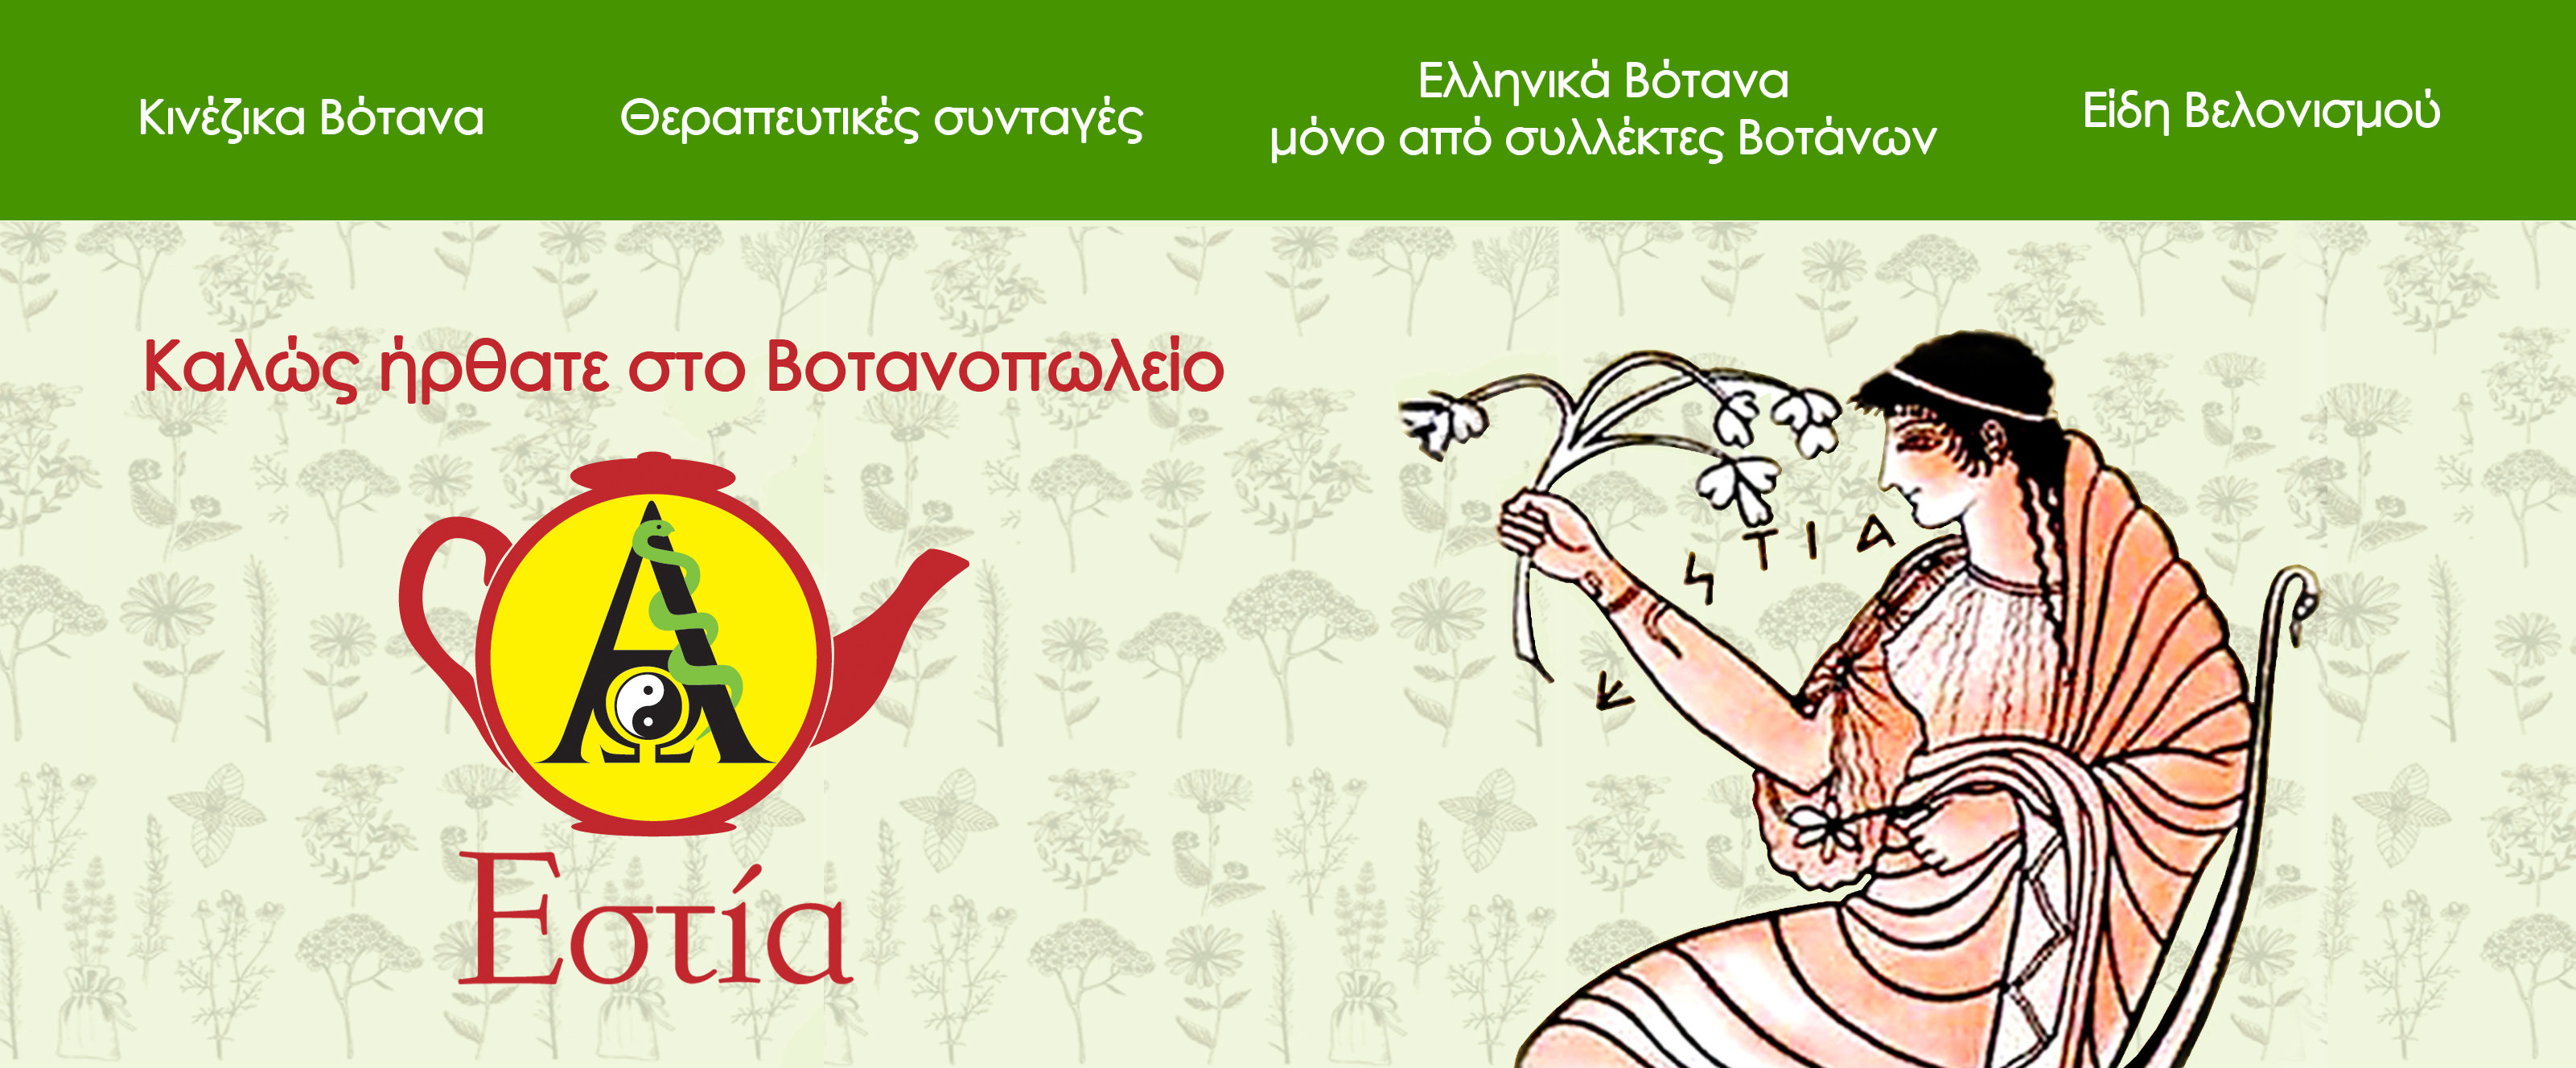 97ca3a4a197b akadimia Eshop - Βοτανα ελληνικα